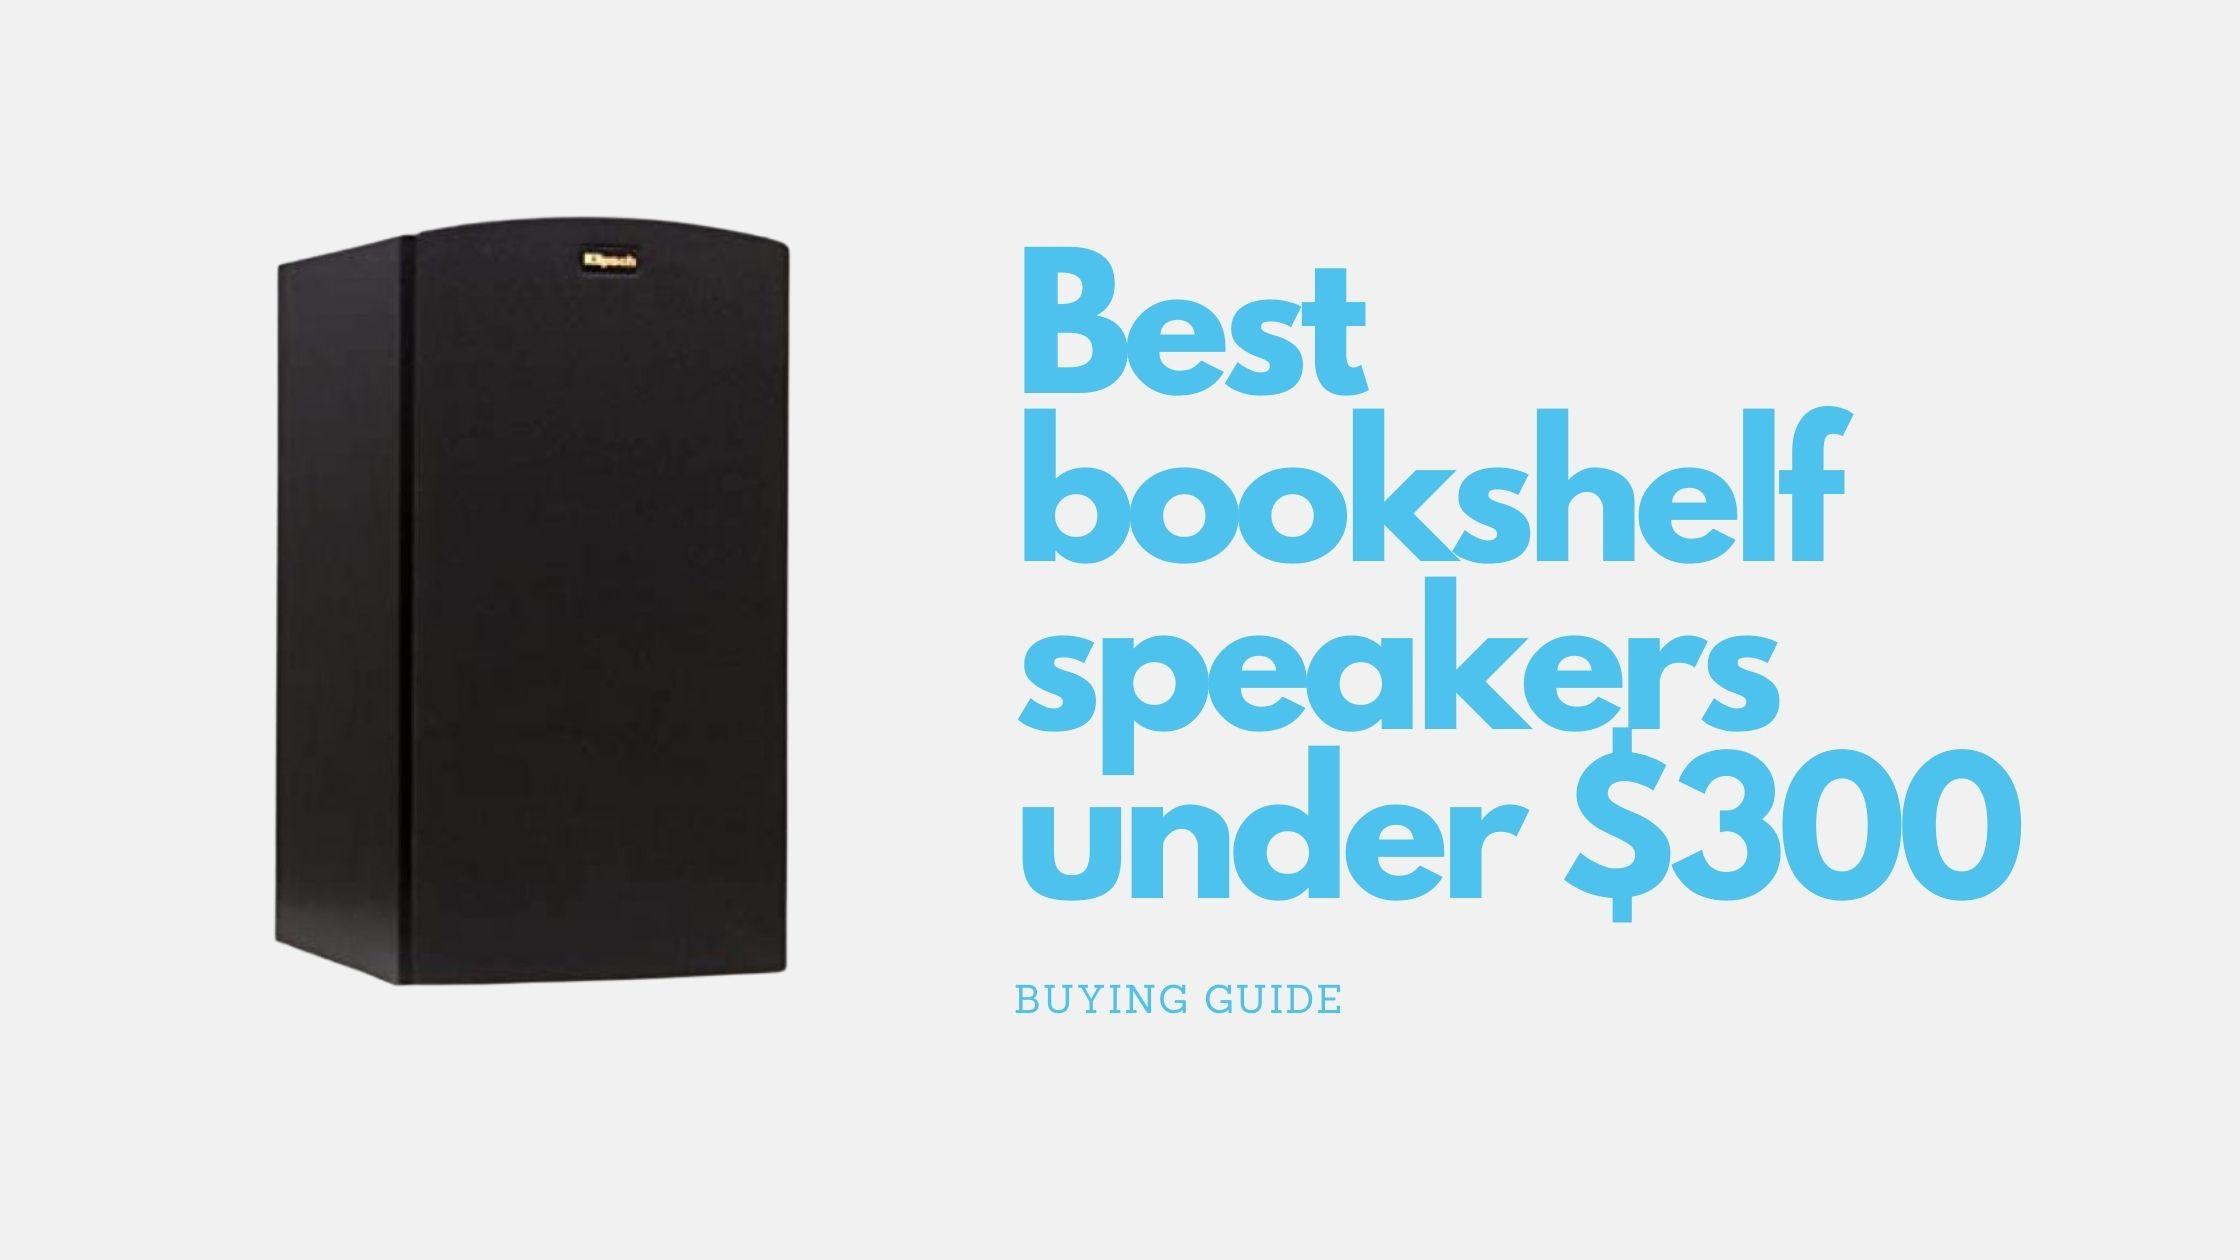 Best bookshelf speakers under $300